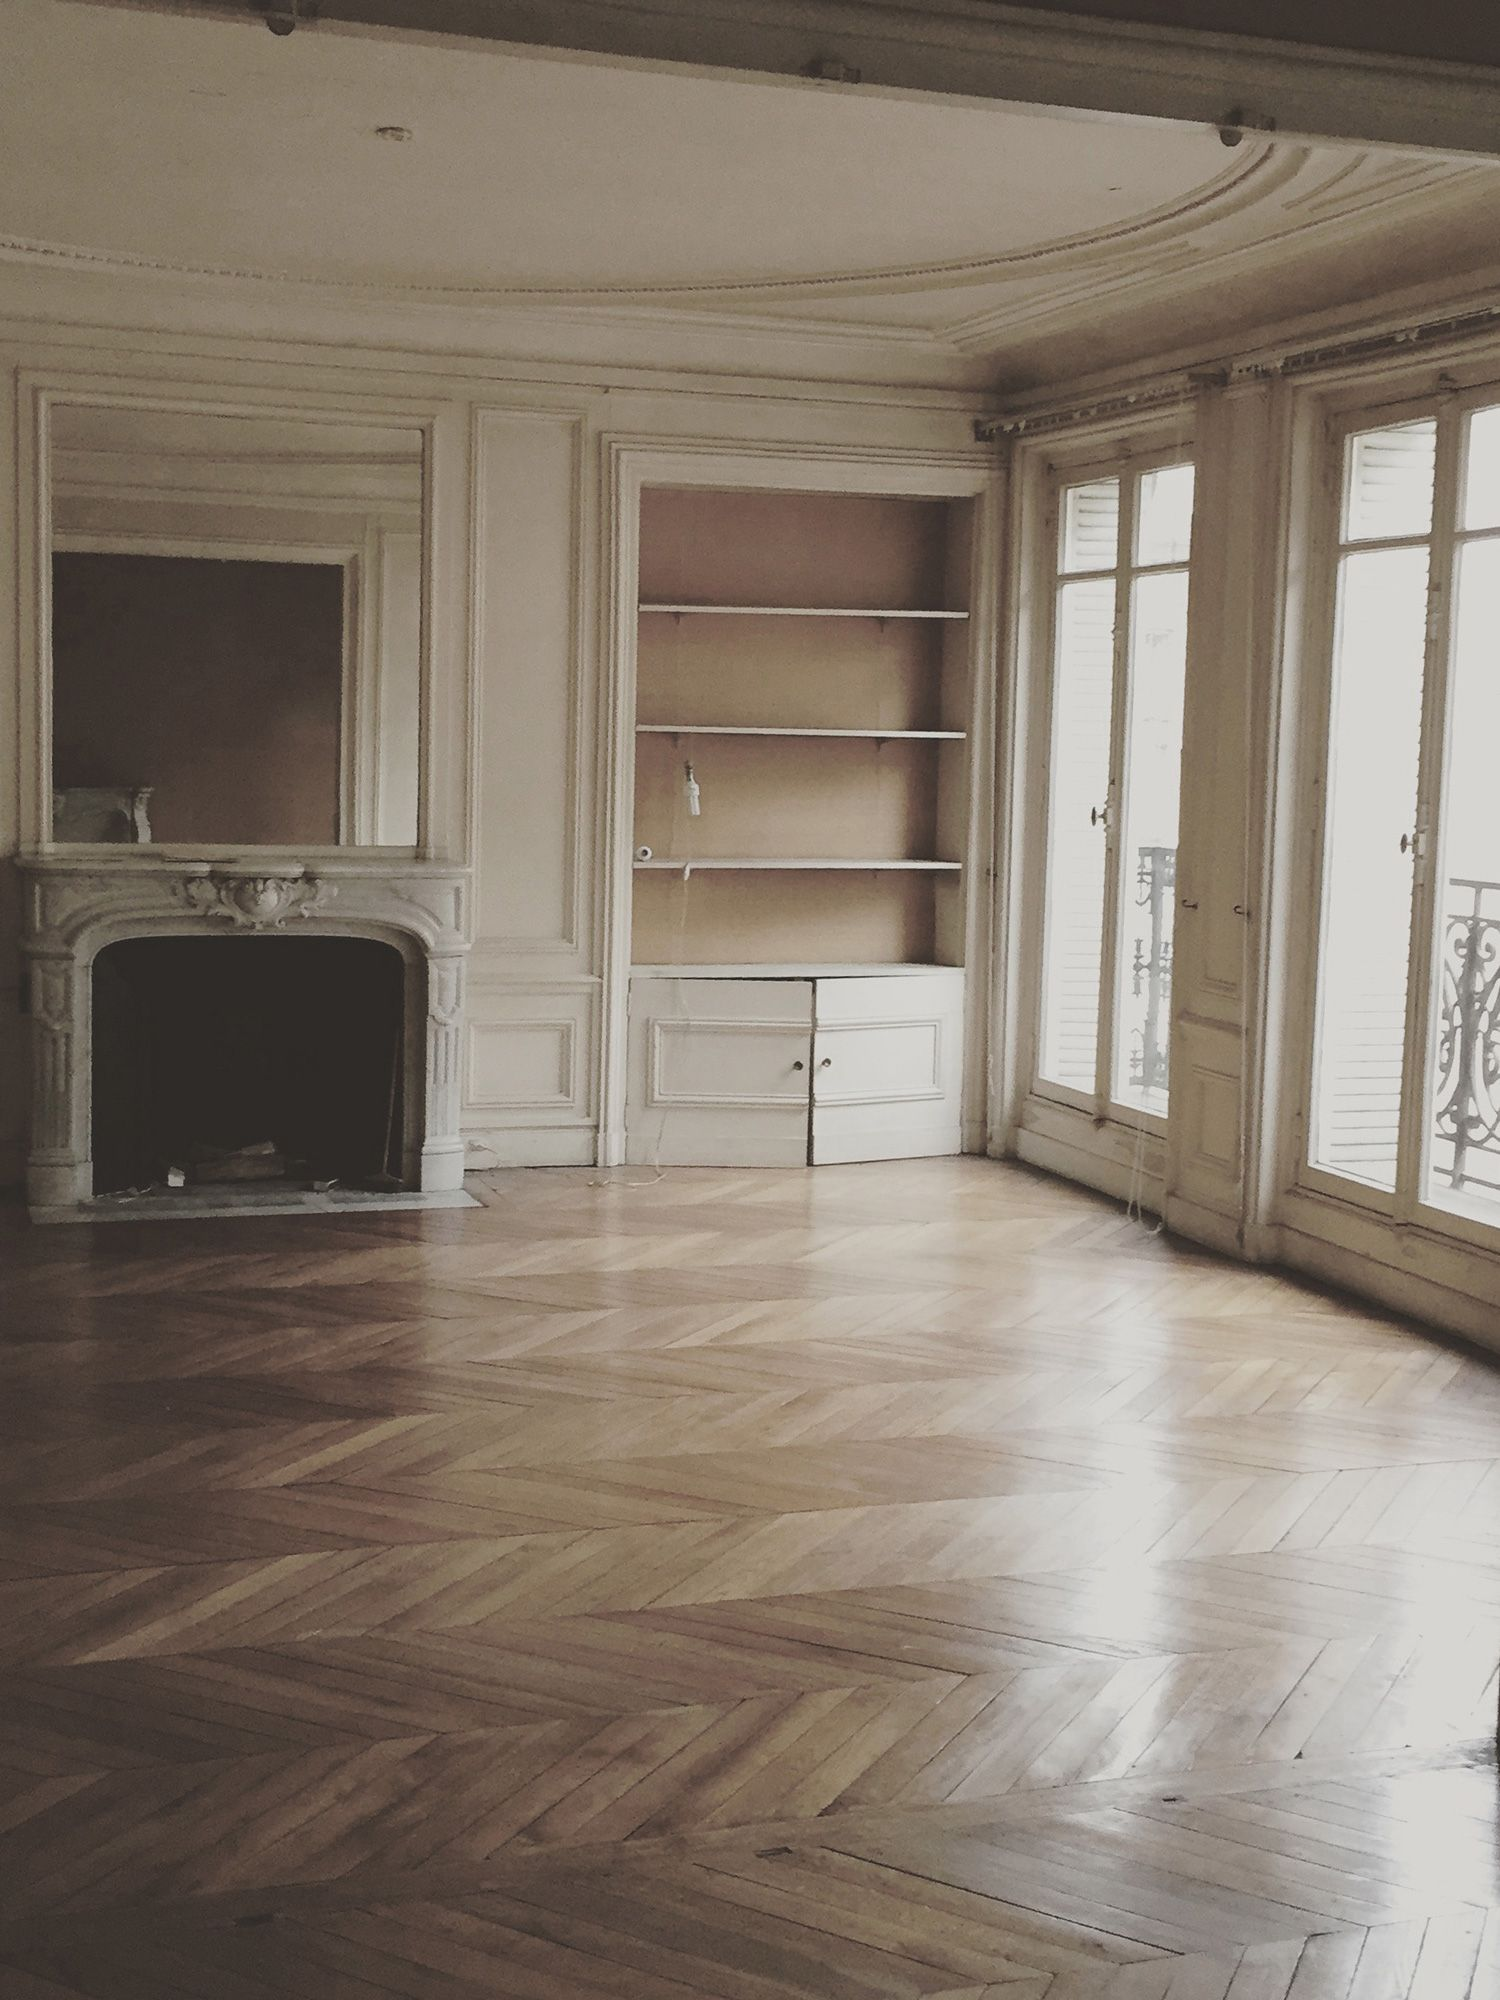 Cristina velani tuileries via bertero nel 2019 for Arredamento stile parigino